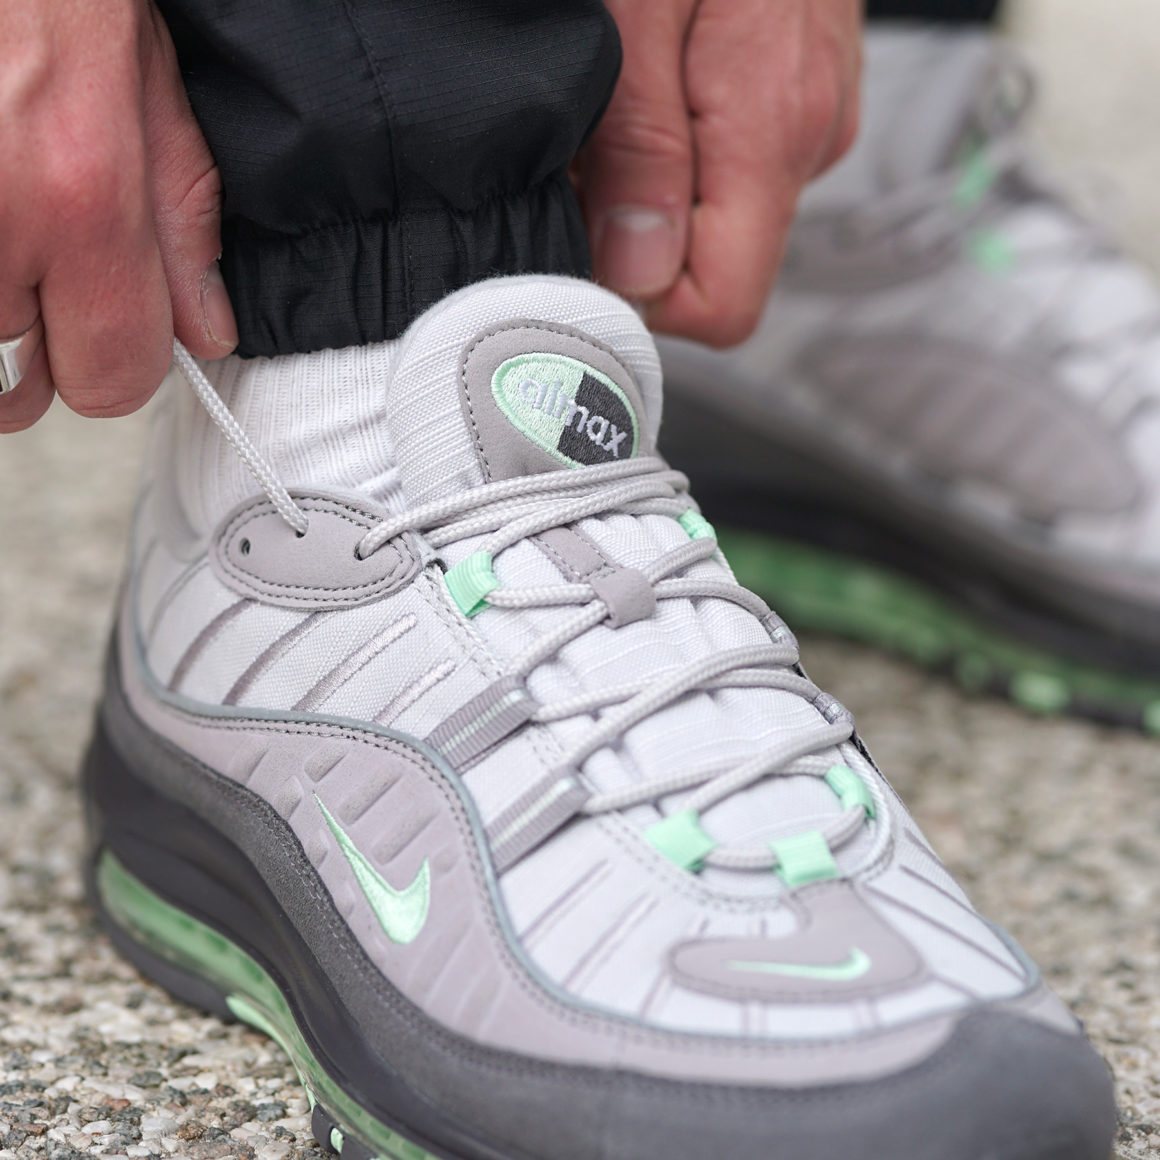 Nike Air Max 98 Vast GreyFresh Mint